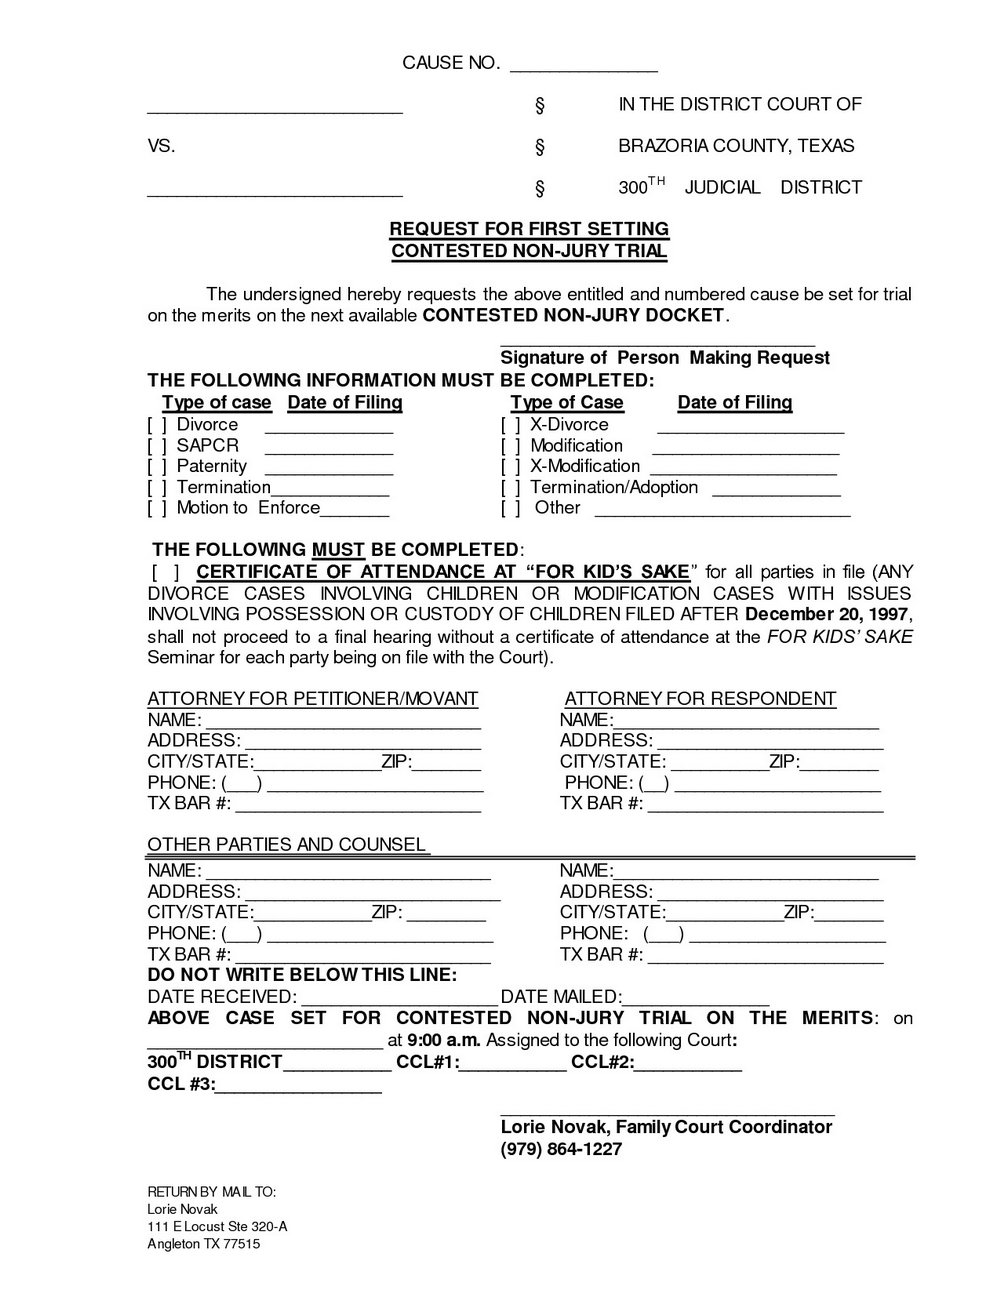 Texas Divorce Forms